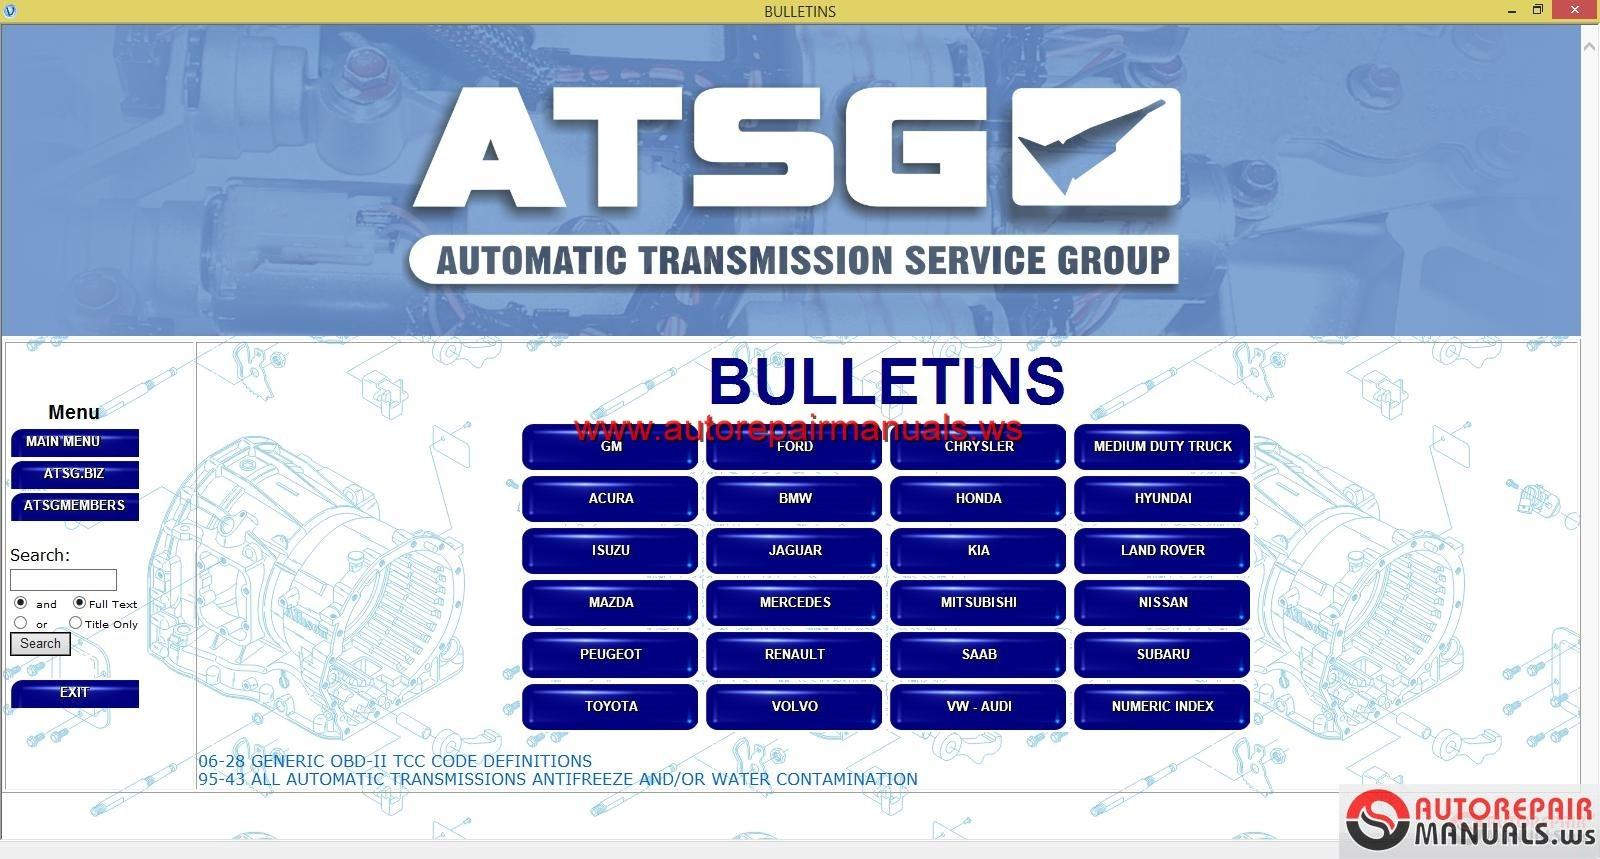 Atsg transmission manuals download.